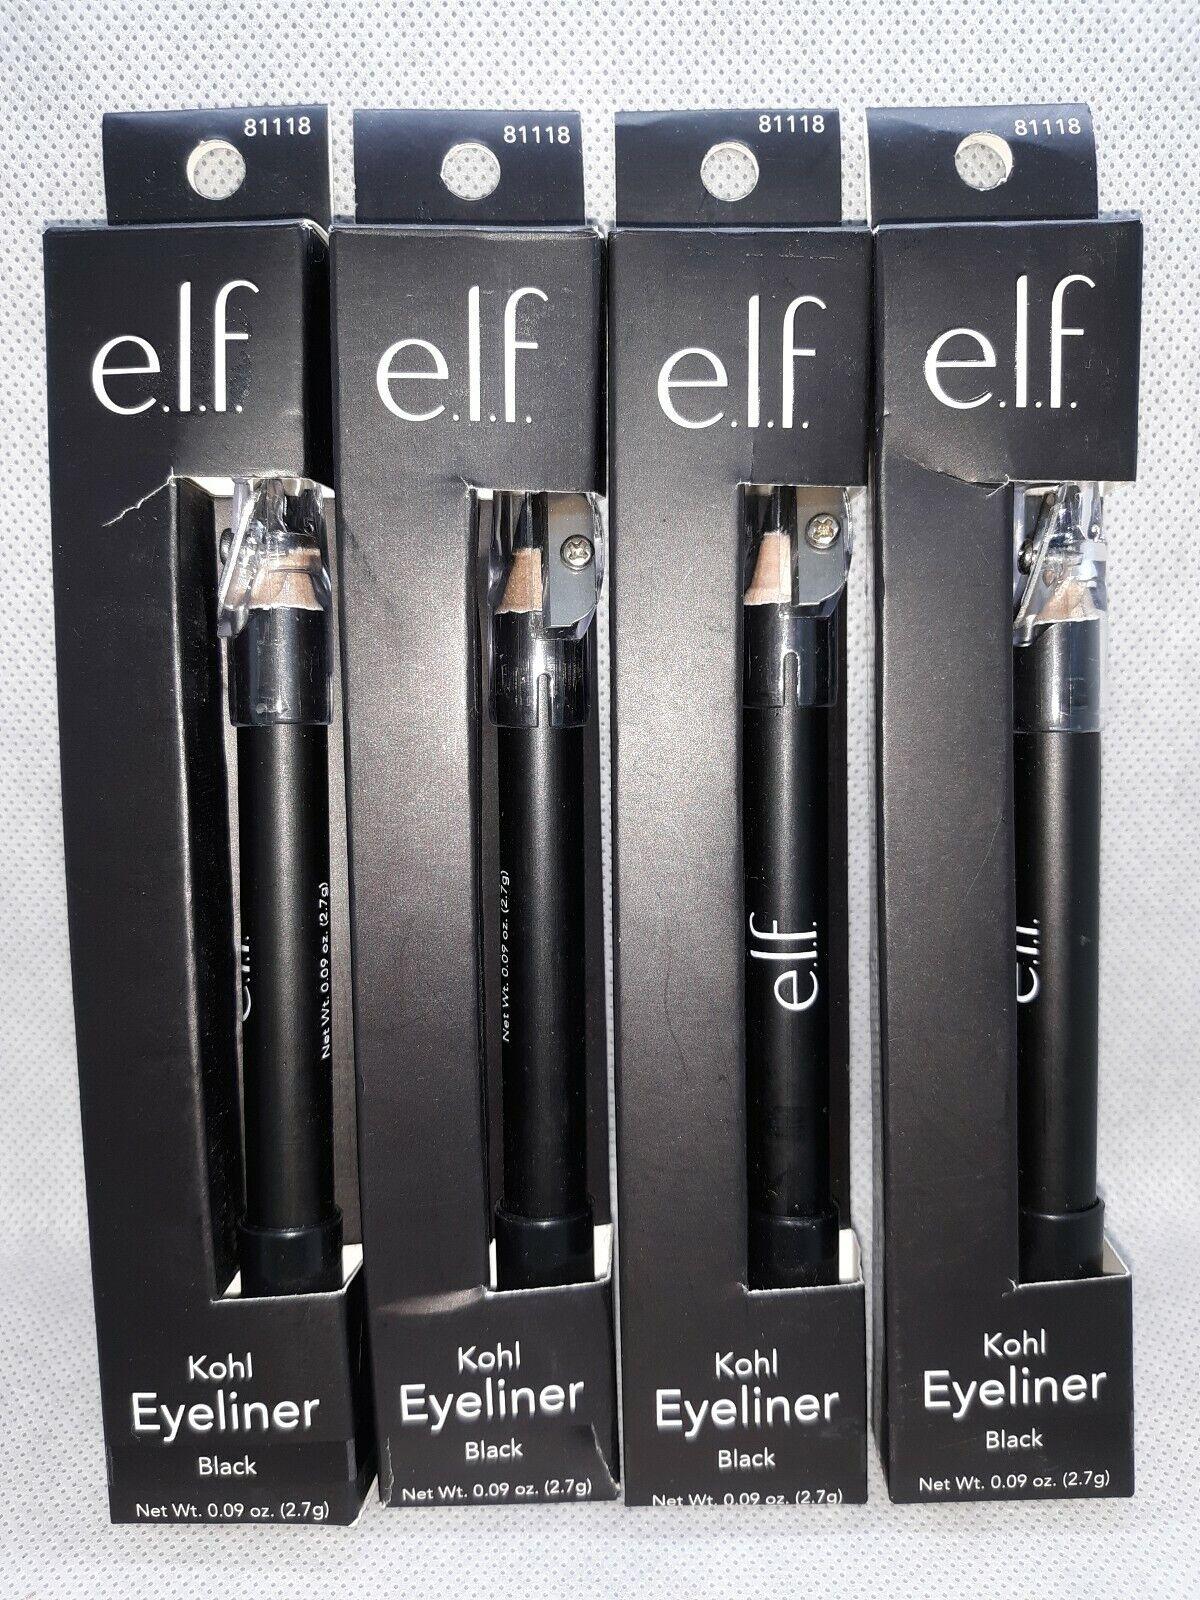 e.l.f. Kohl Eyeliner Black for sale online | eBay